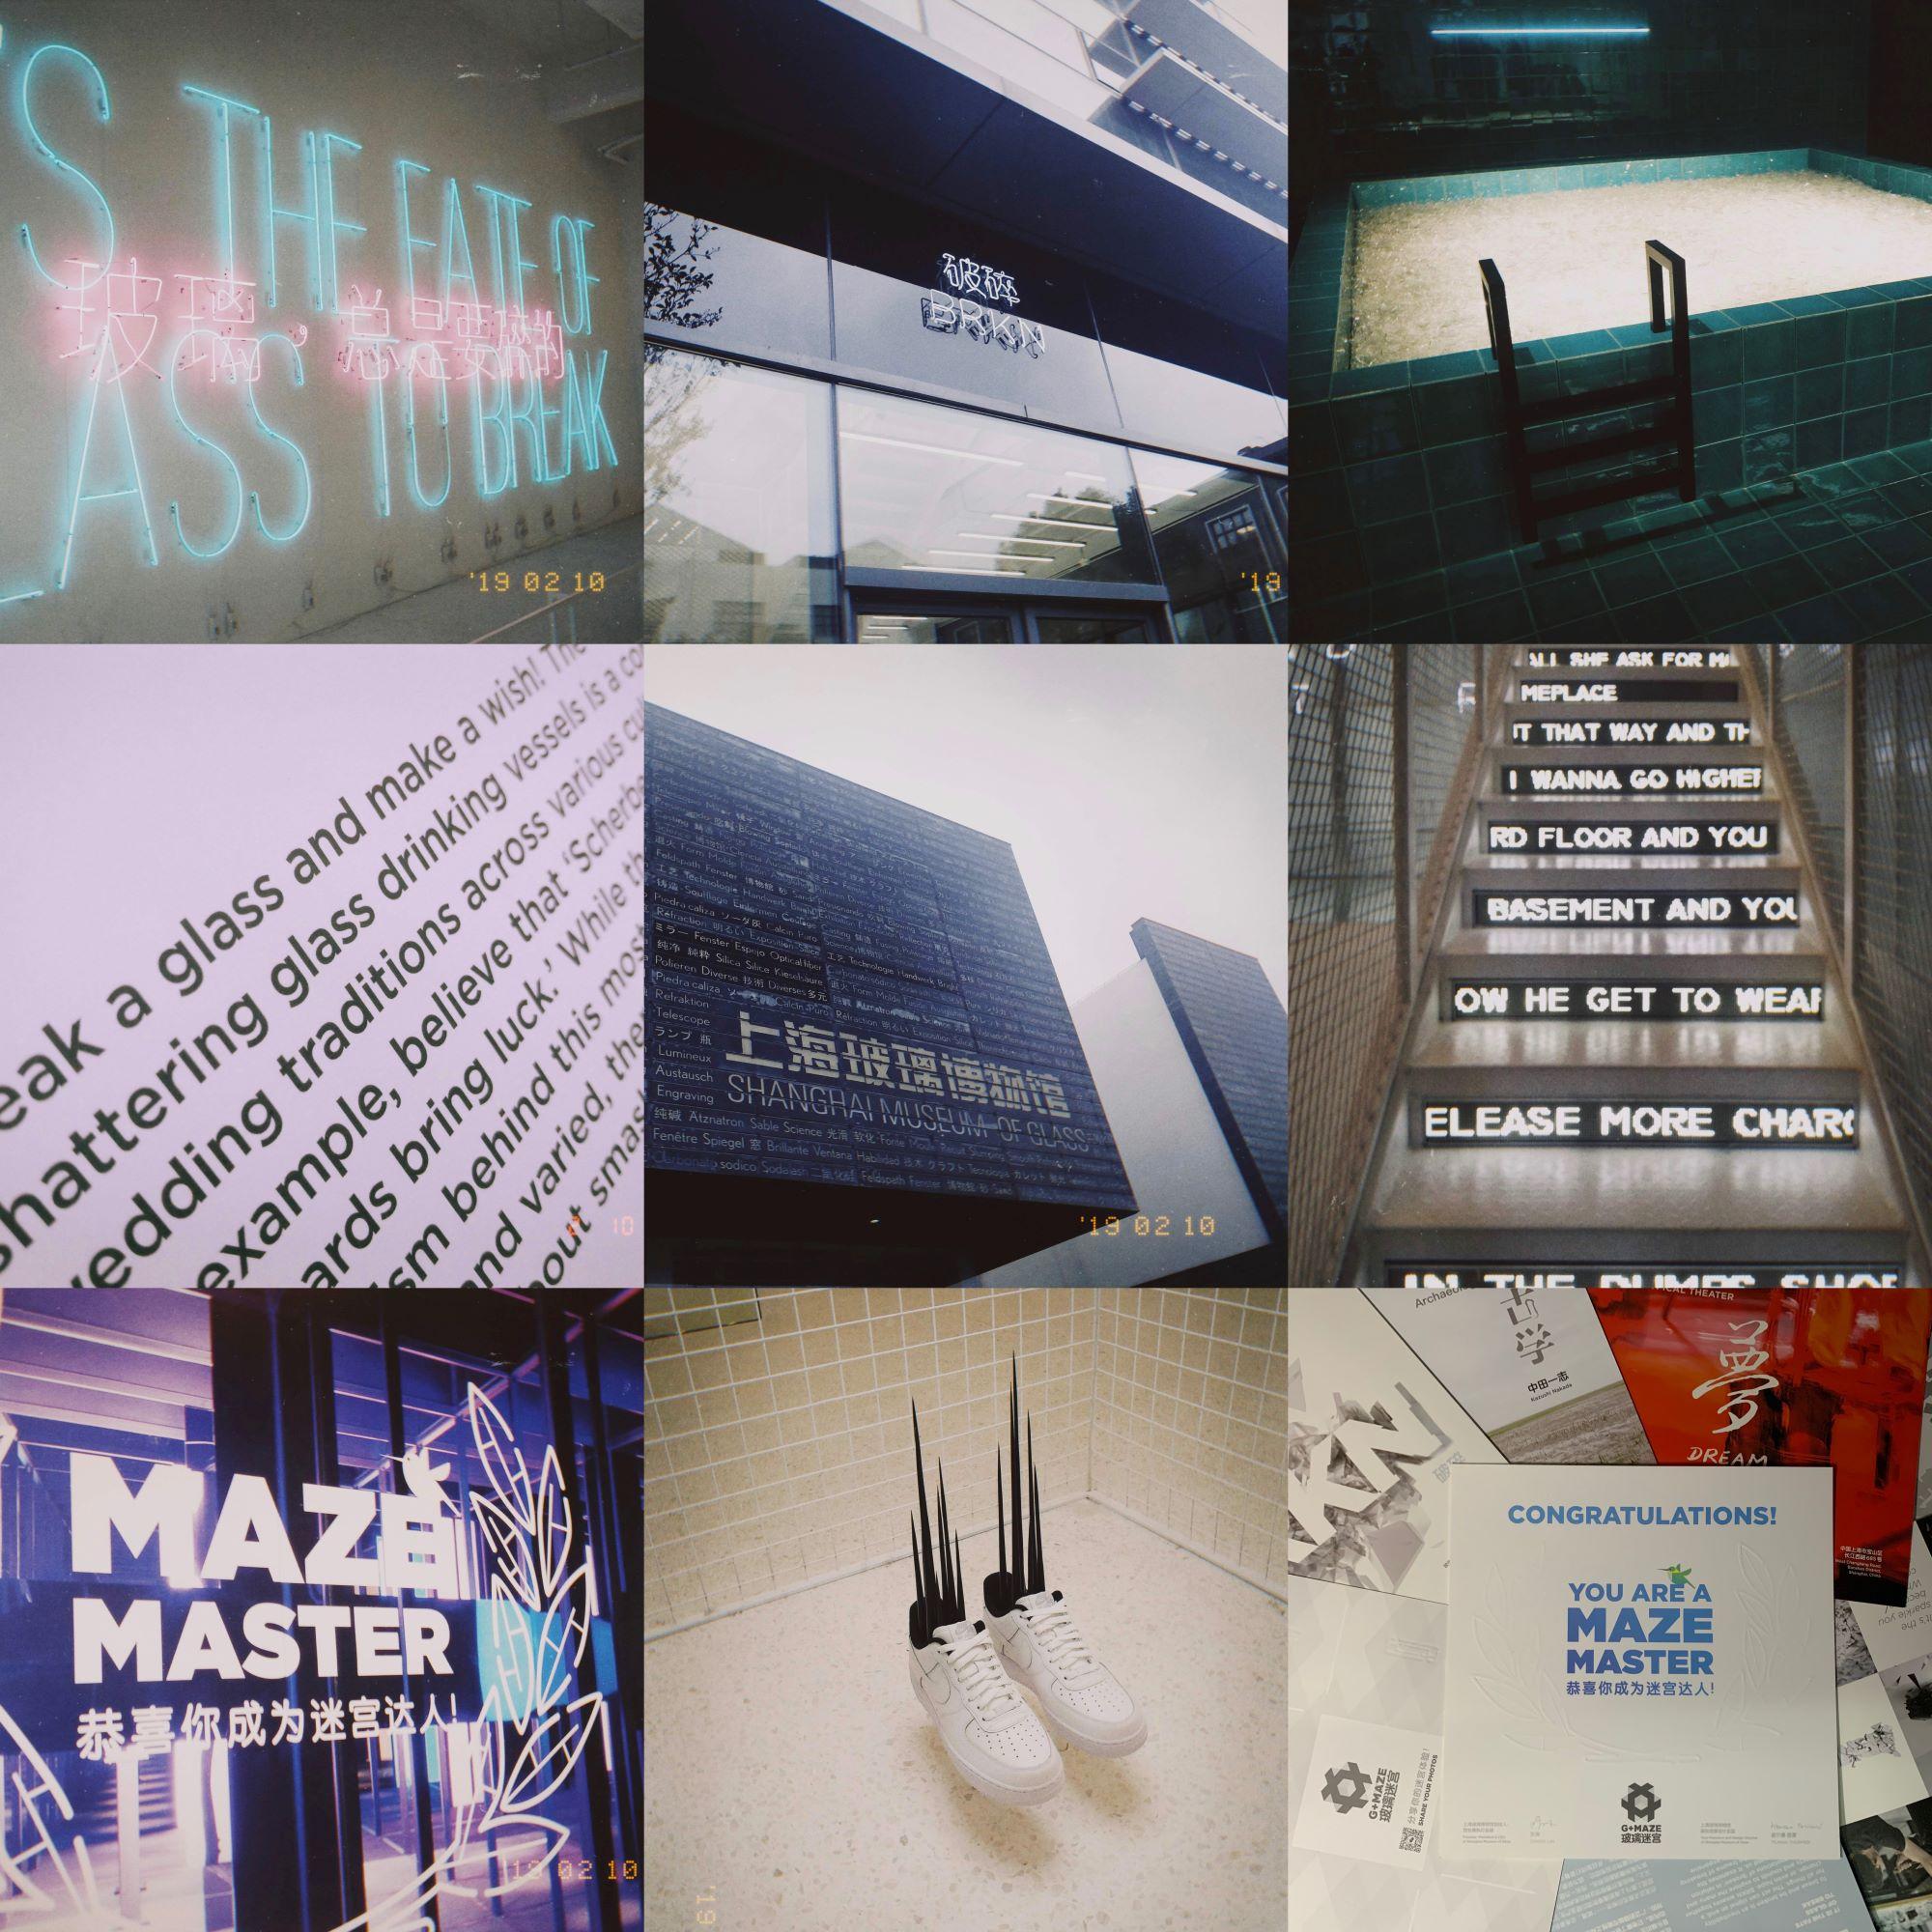 shanghai-museum-of-glassc3b8ff0ace2aabb6.jpg